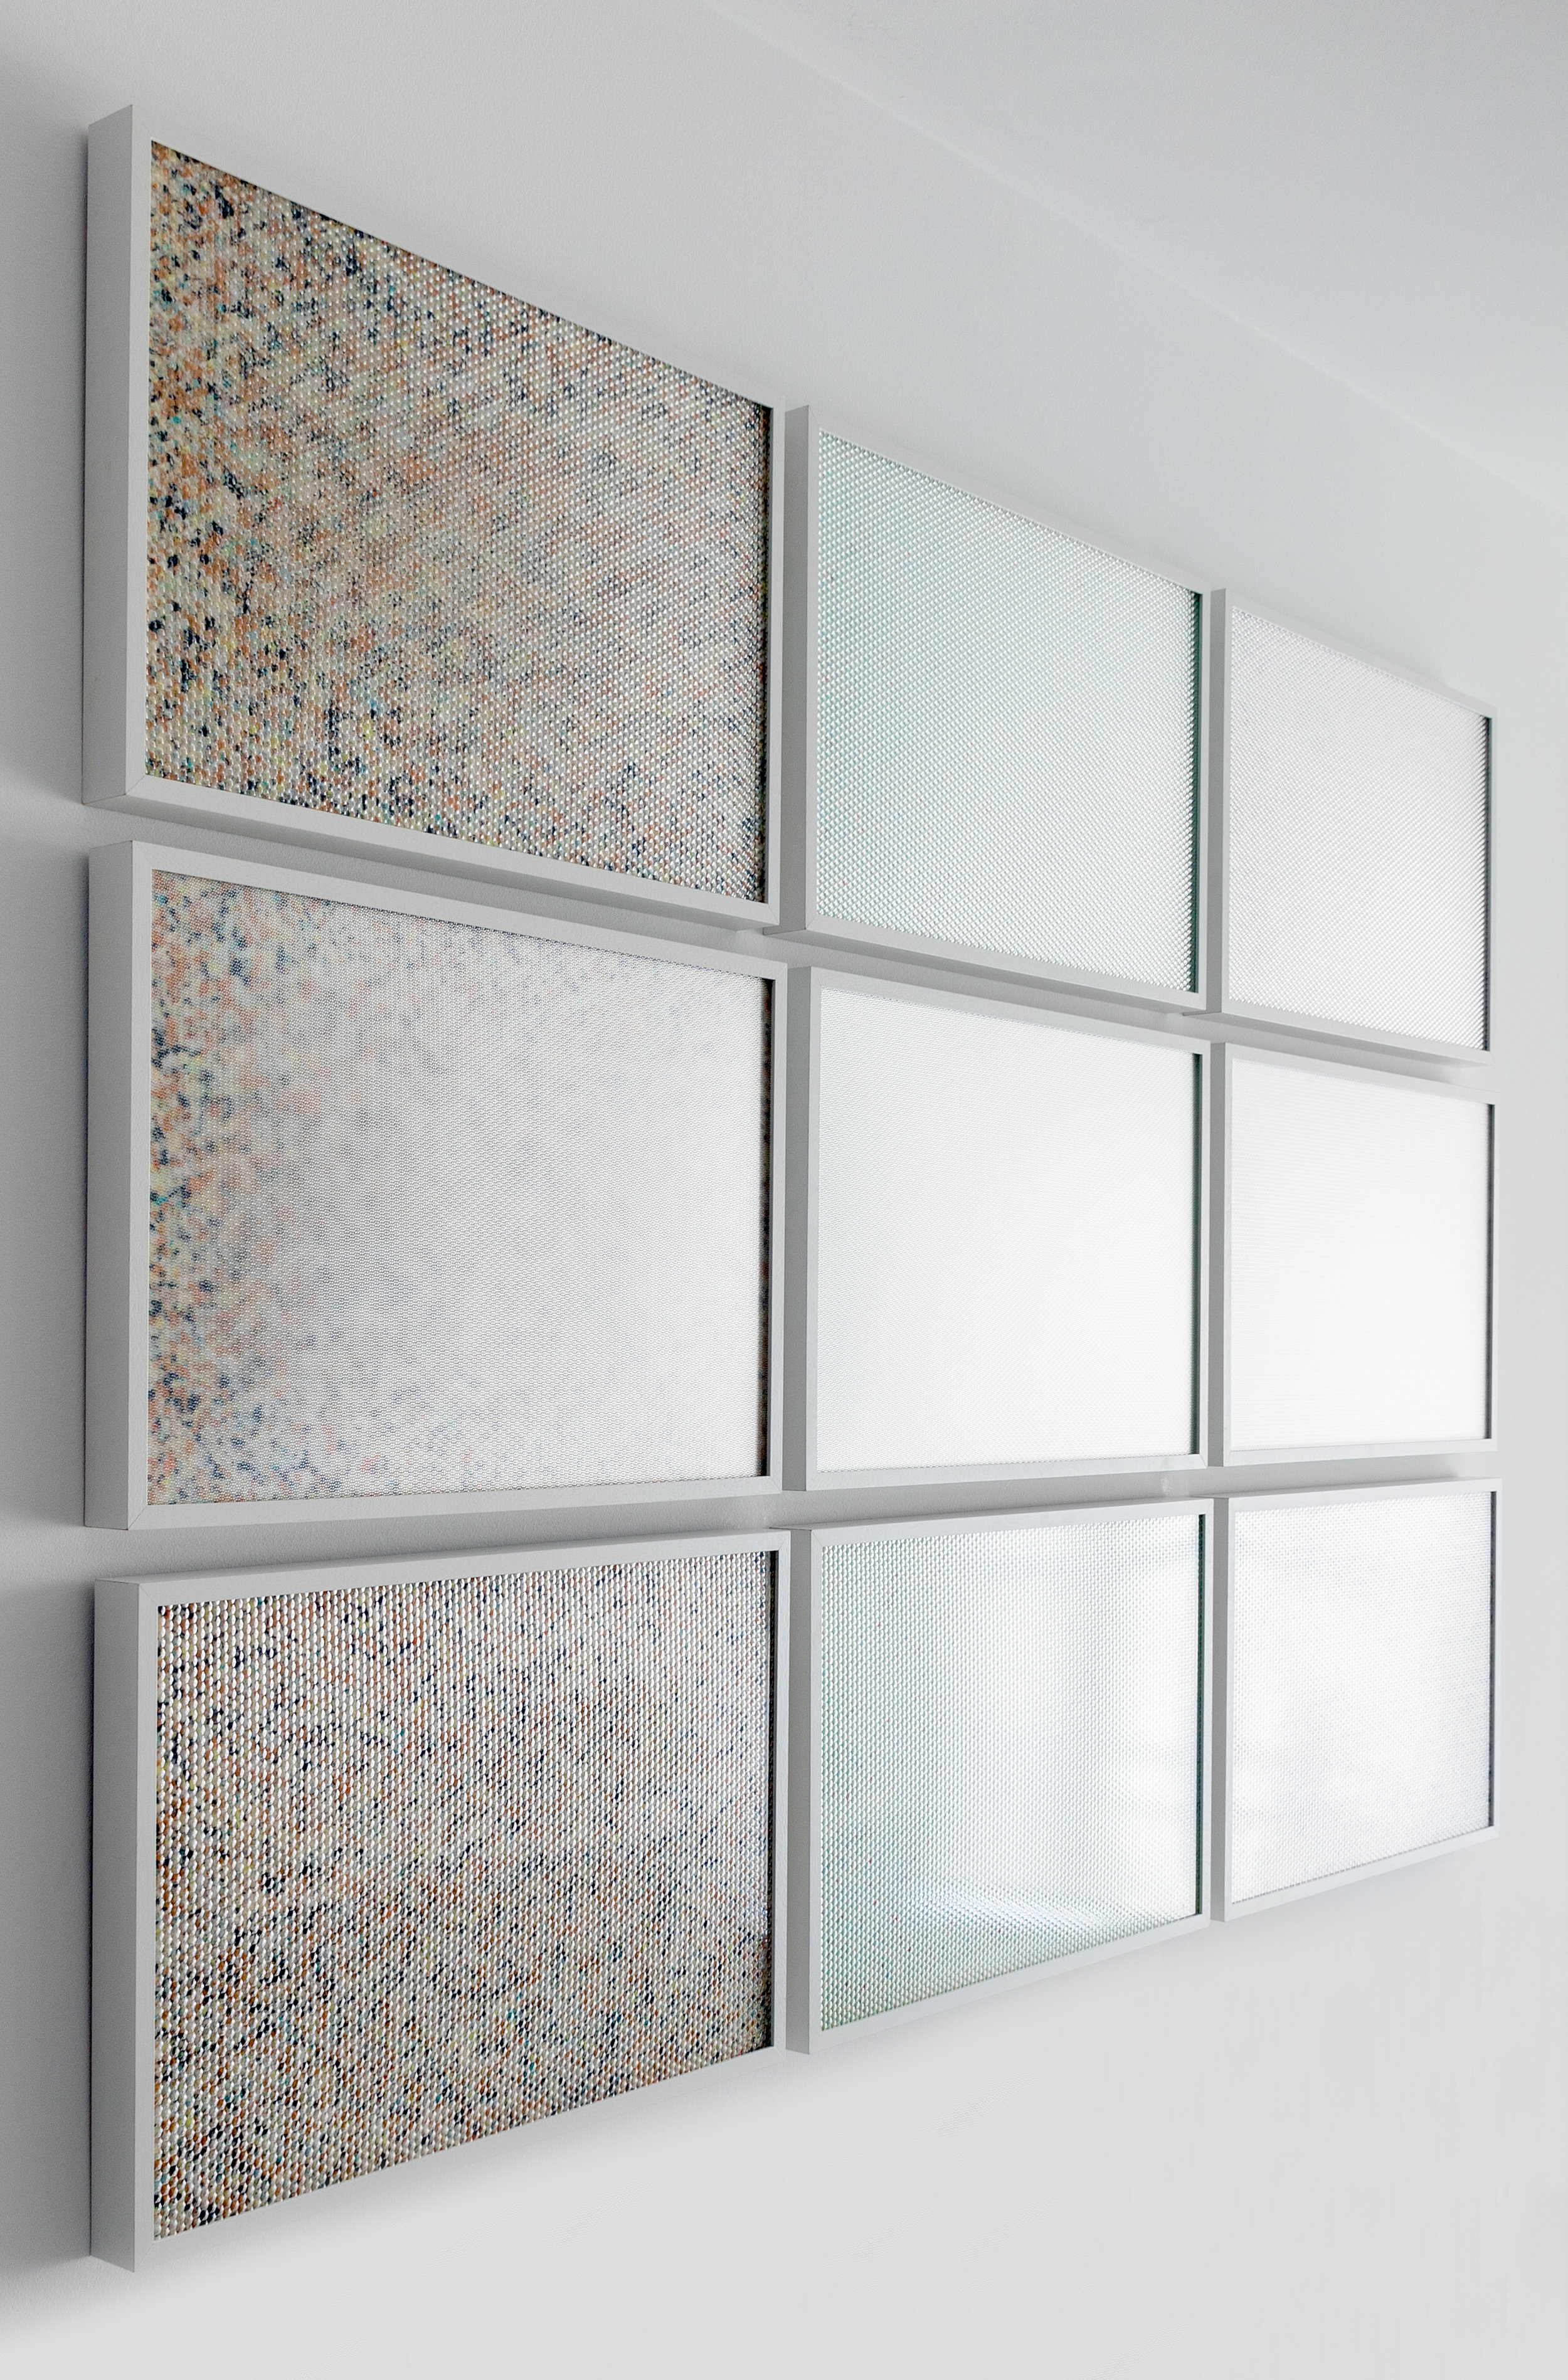 Molecular,  2015 - Side view 9 panel grid, painted insulation foam beneath structured Plexiglas